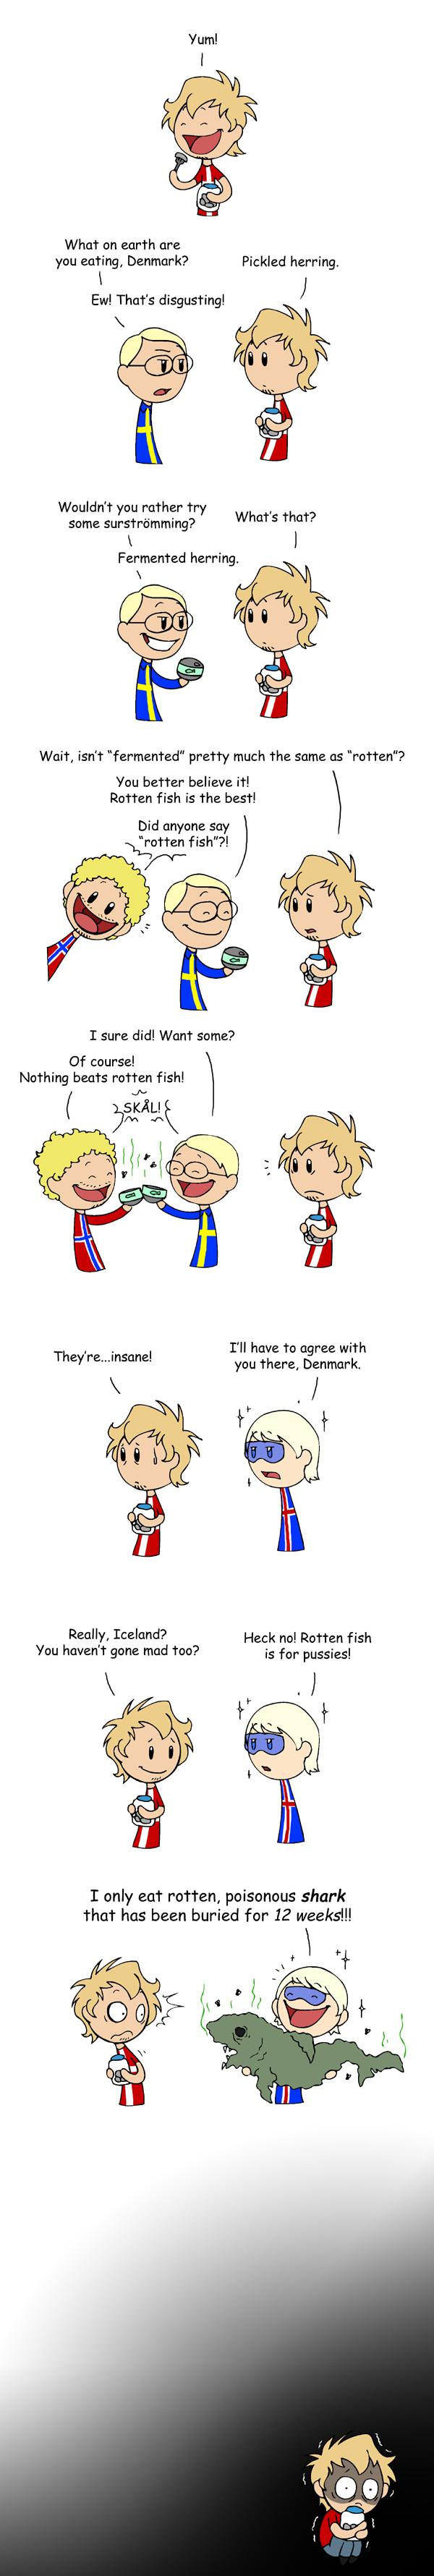 How It Is To Be Danish Imgur Scandinavia Country Jokes Nordic